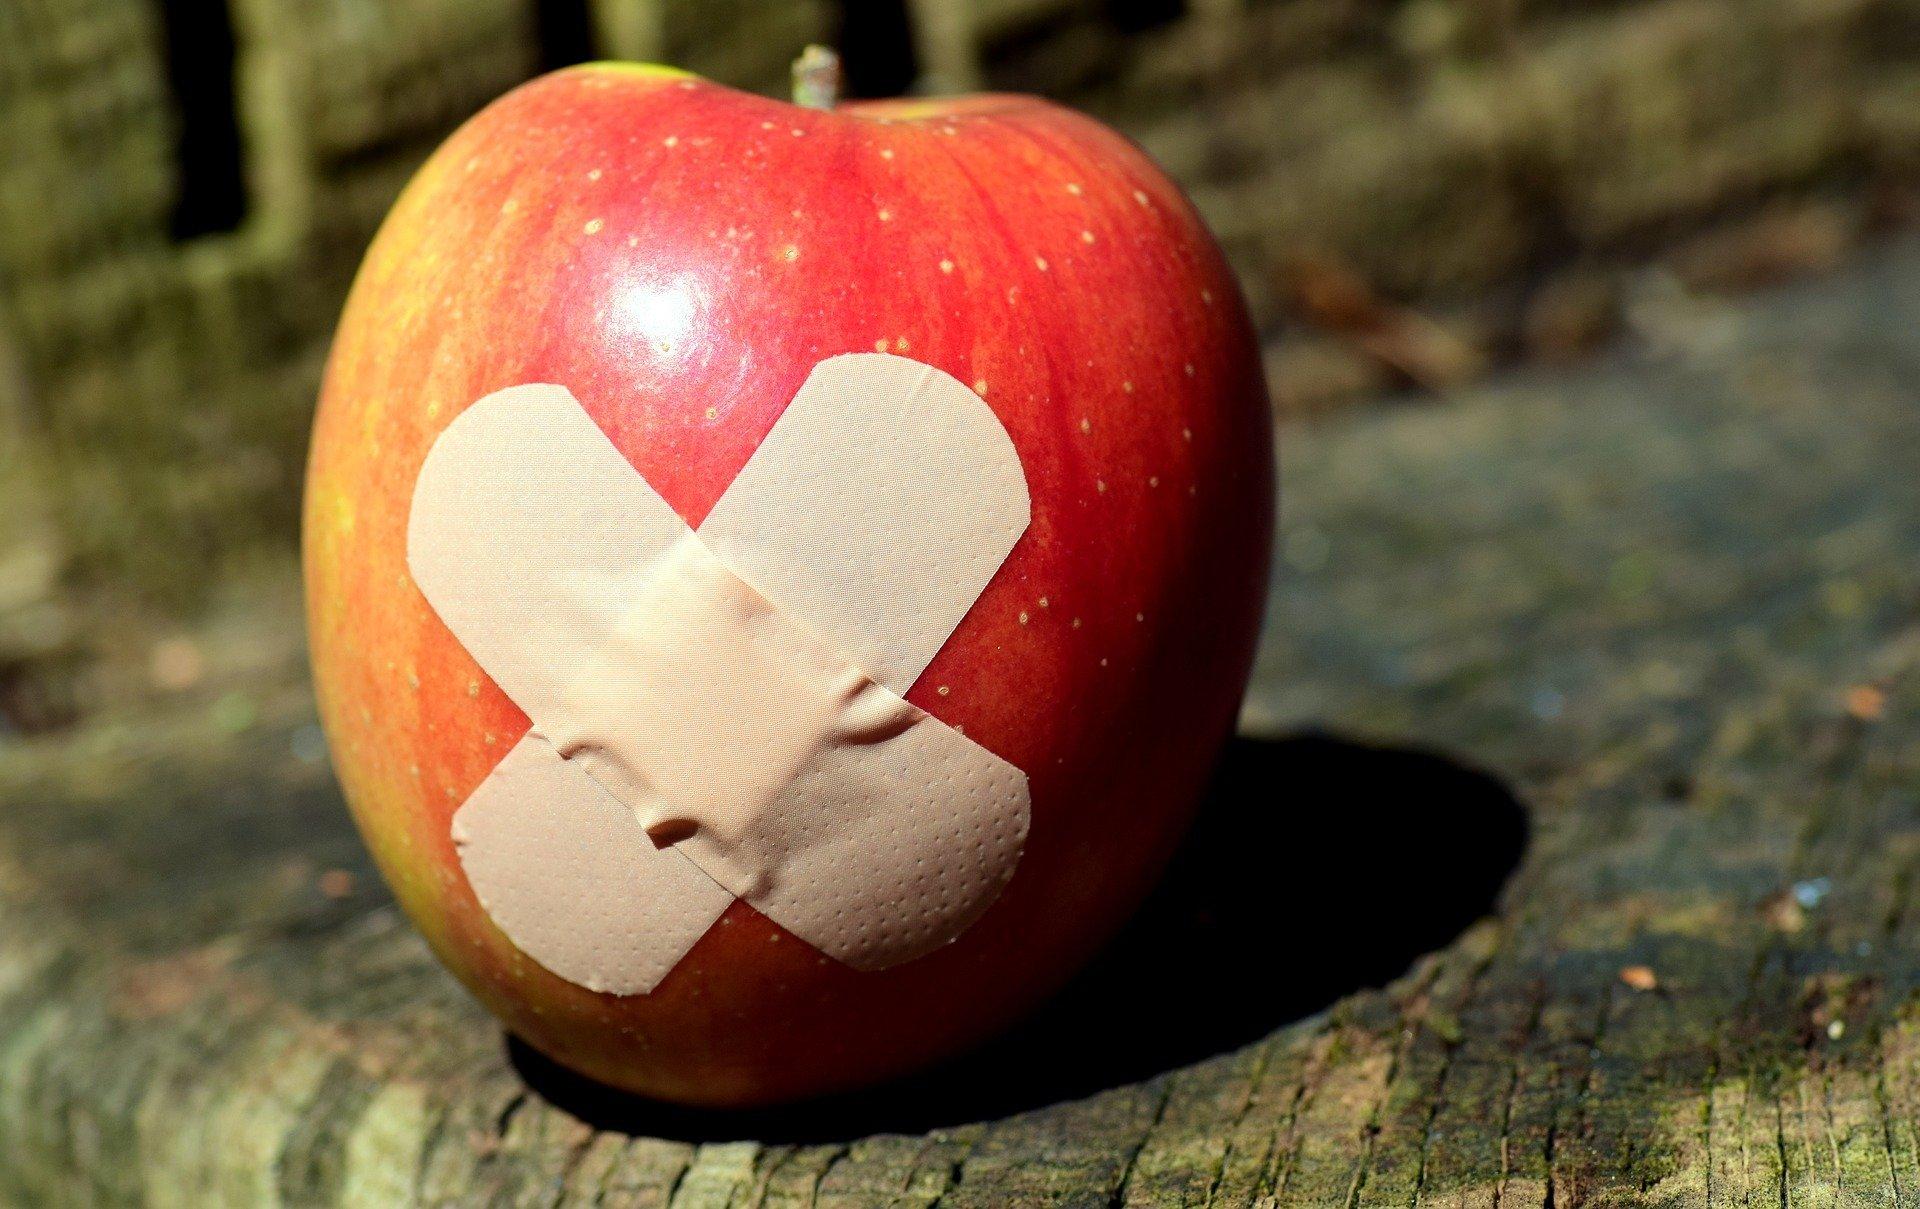 apple-2299019_1920